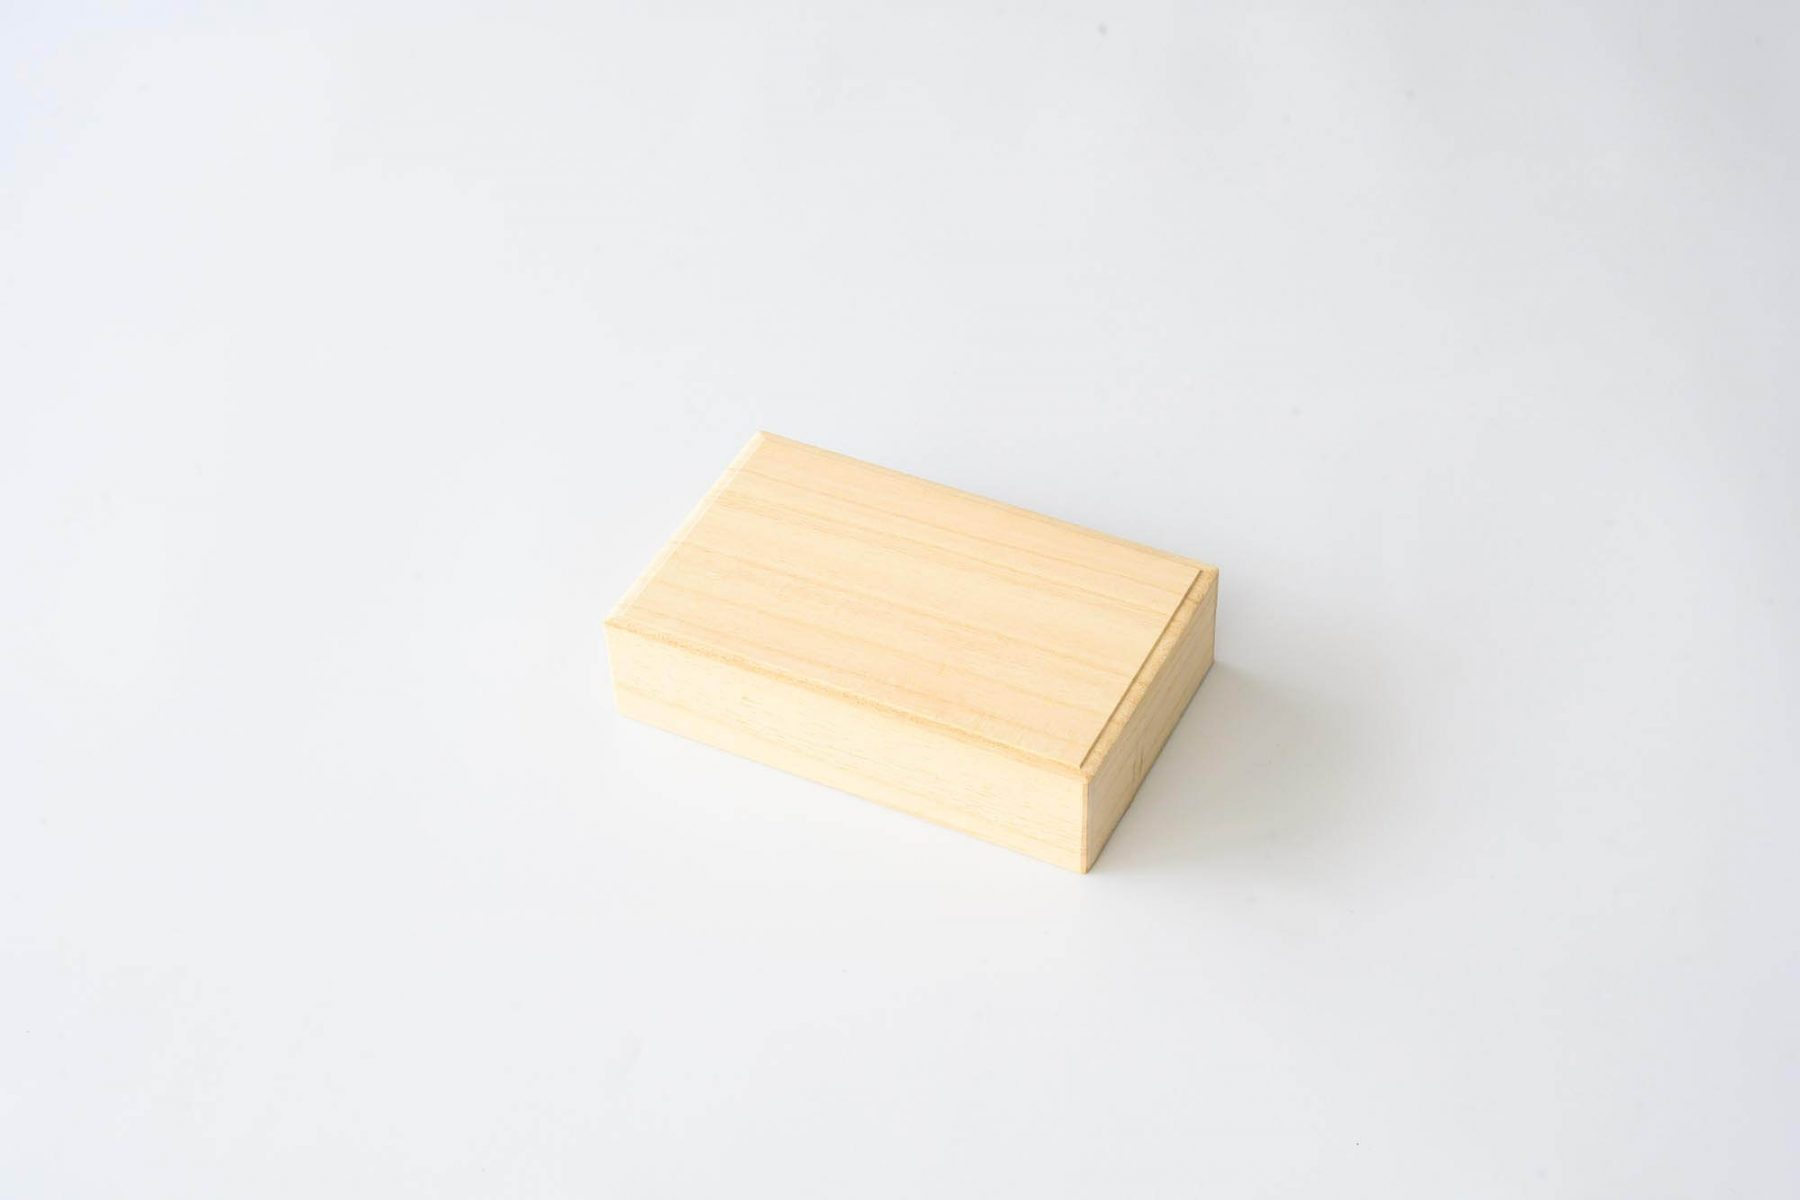 小物入れ用桐箱